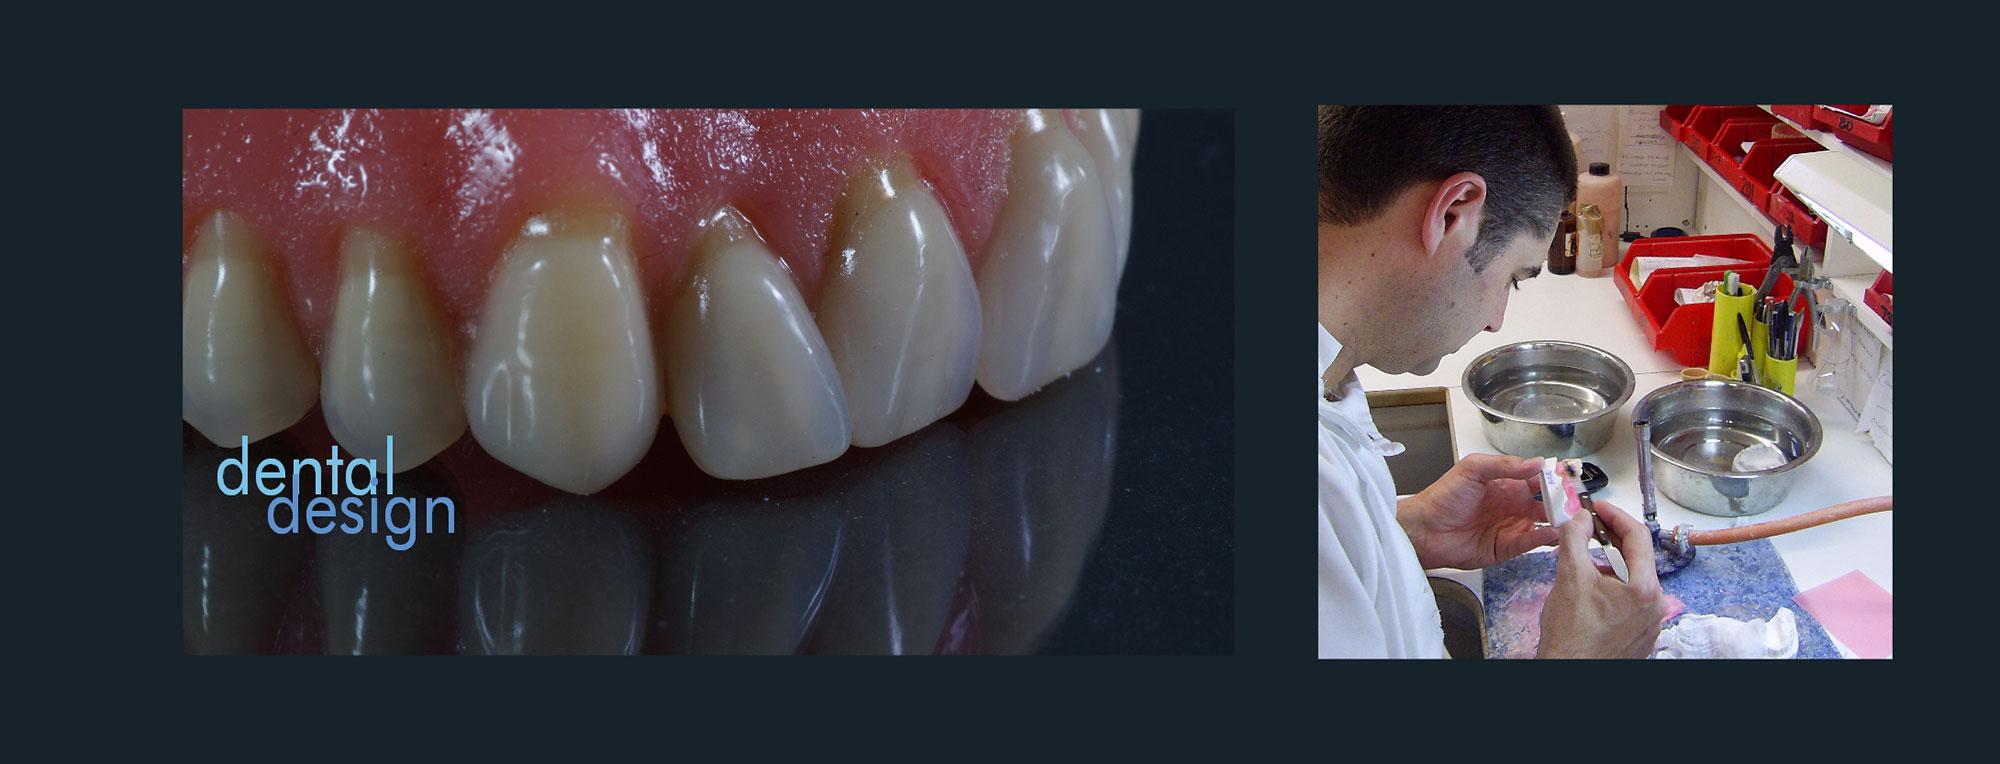 Full Service Dental Laboratory